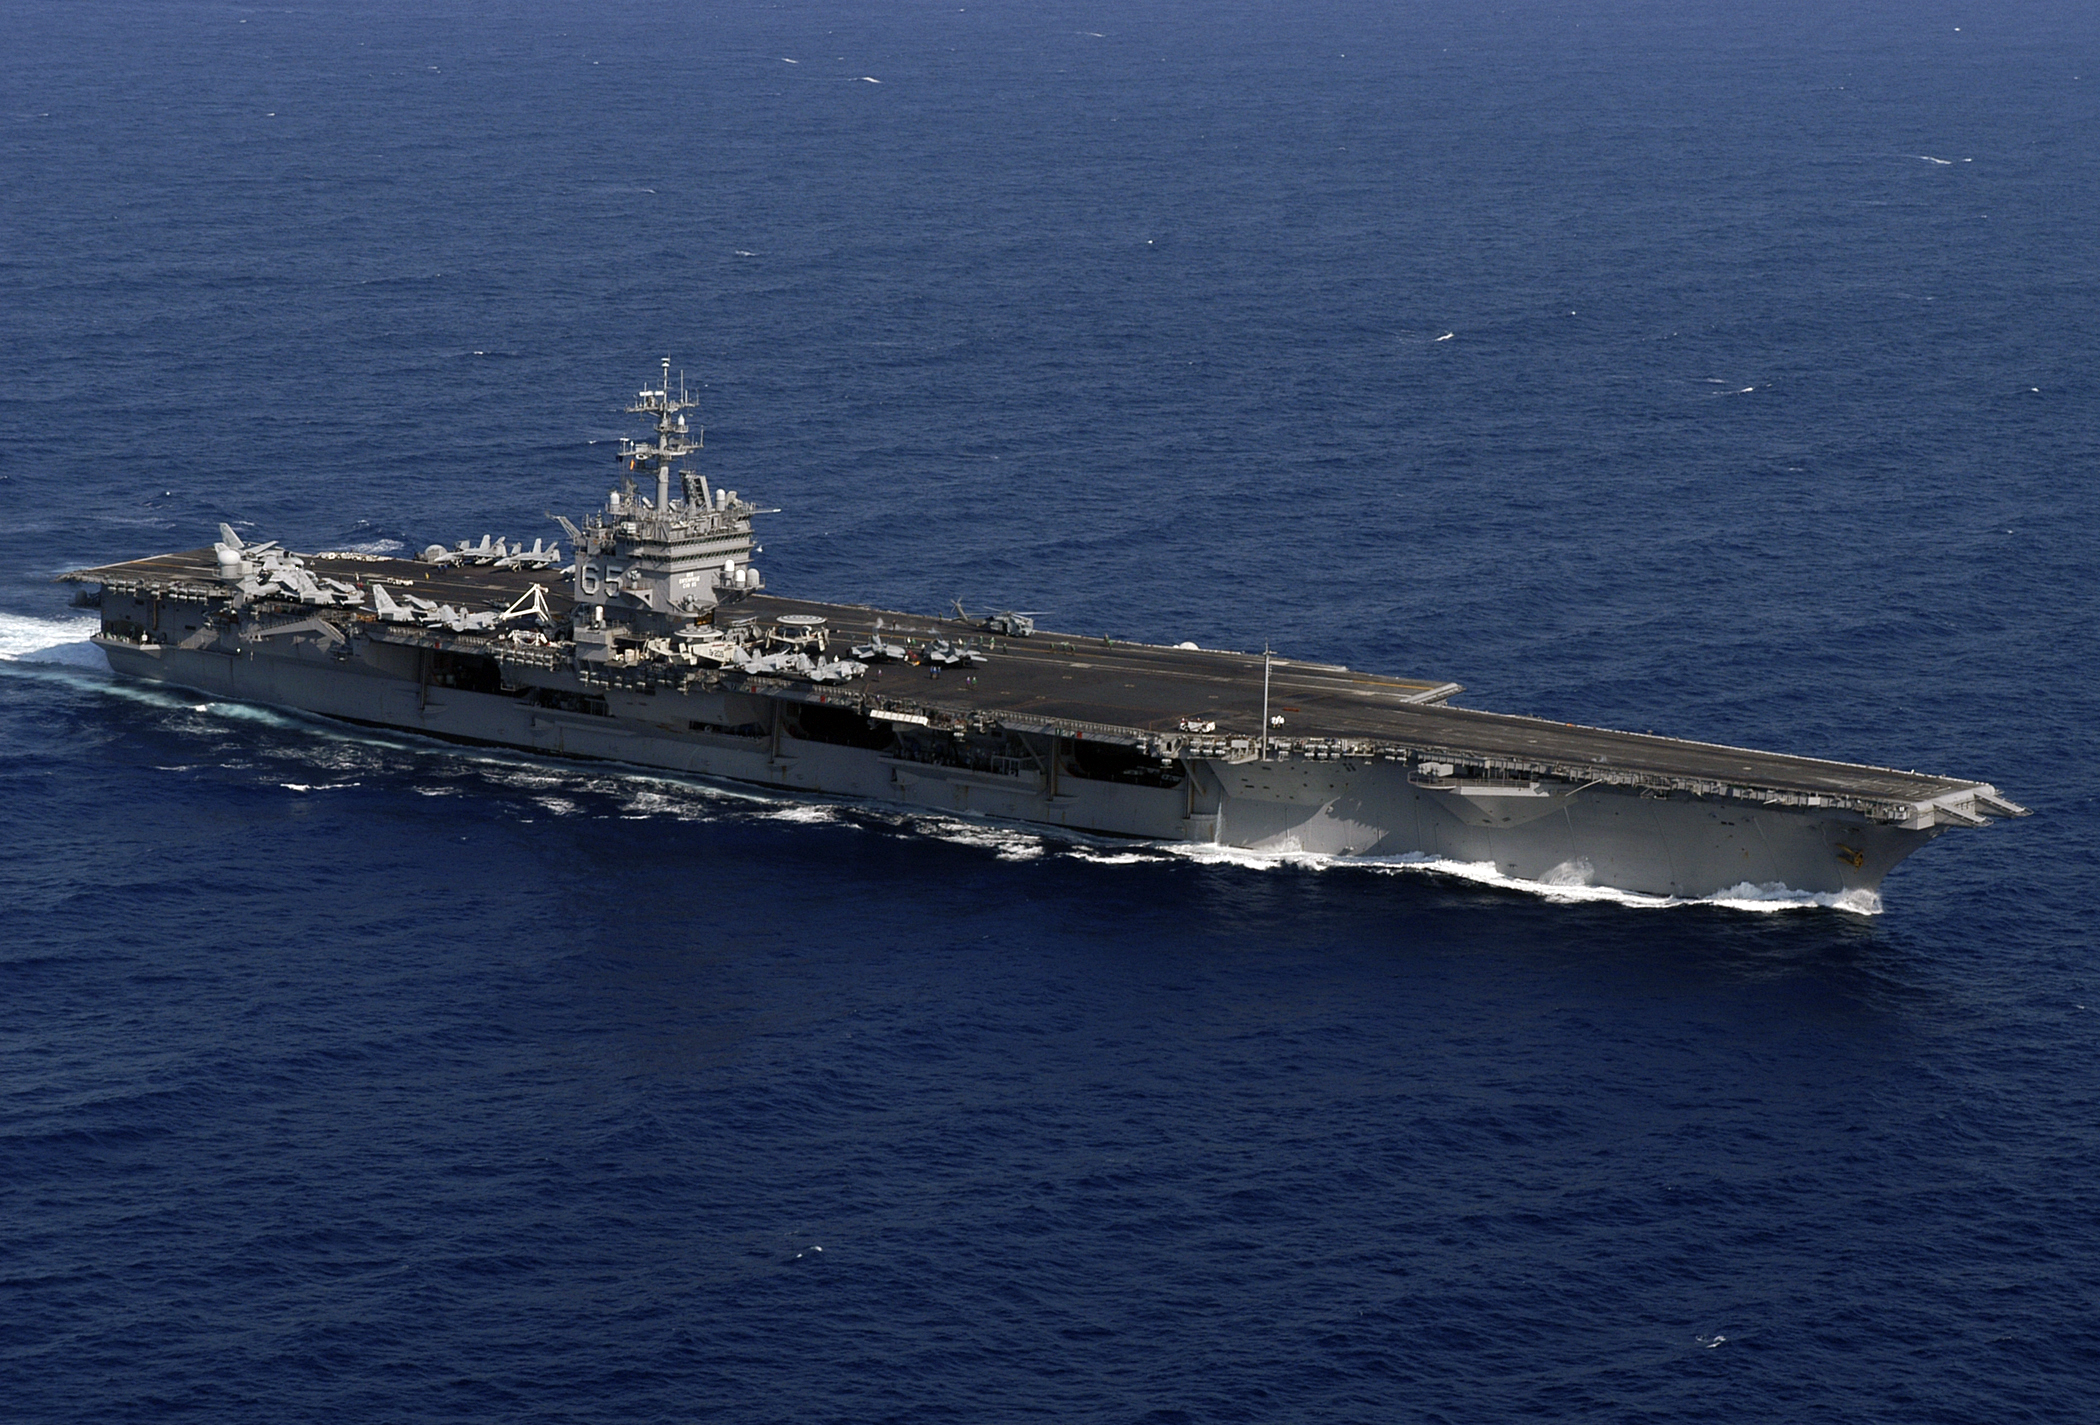 USS ENTERPRISE CVN-65 8X12 PHOTO US NAVY SHIP ATLANTIC 6 ...